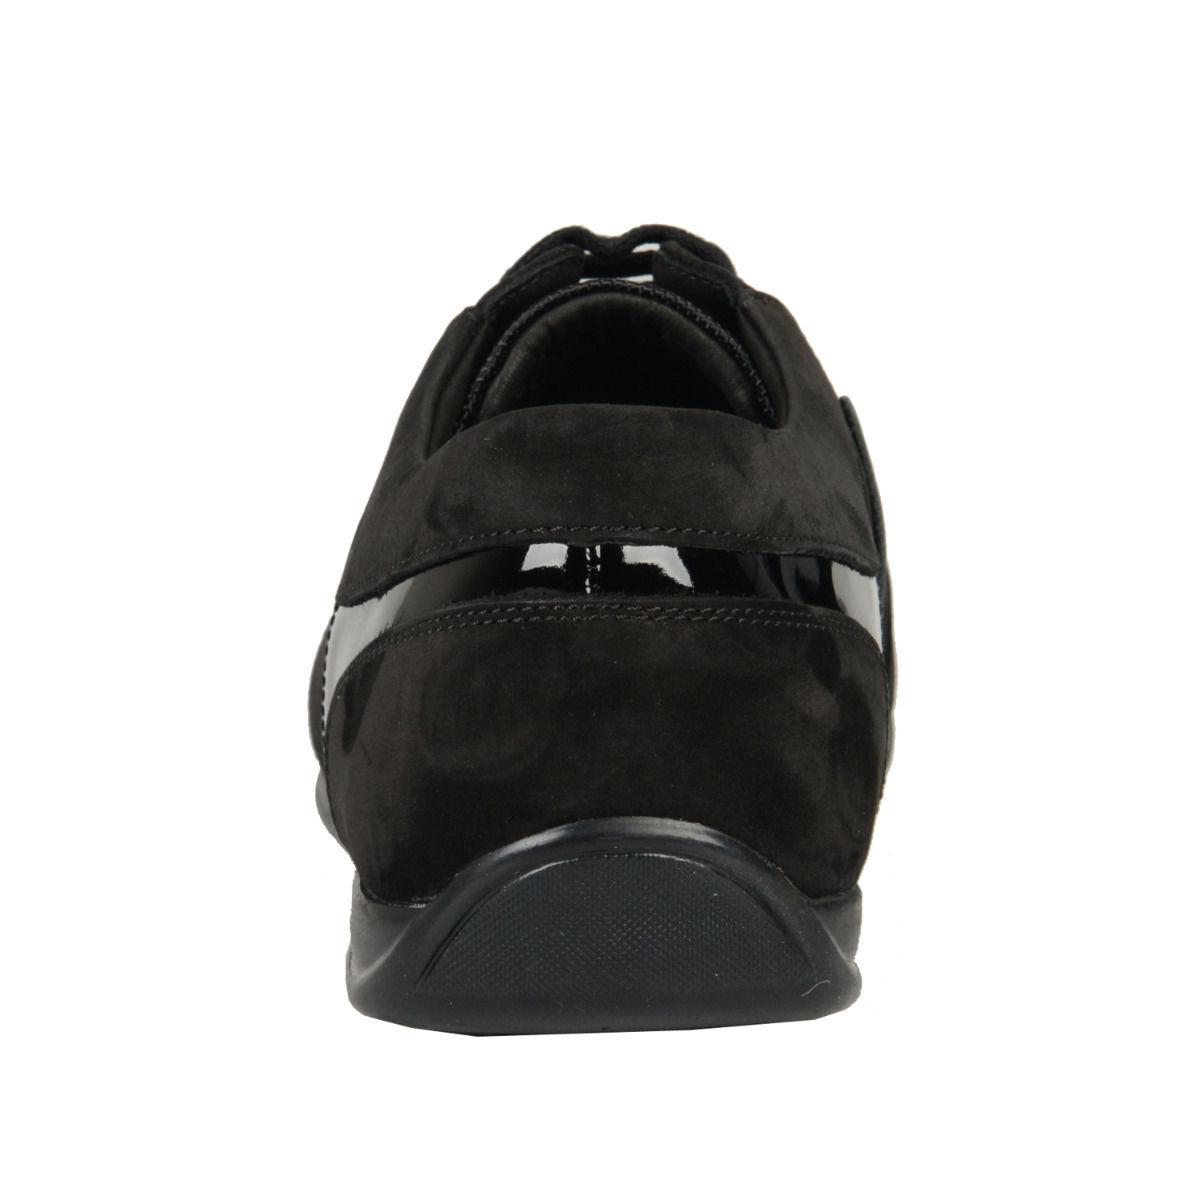 Versace Turnschuhe Turnschuhe Turnschuhe Gr. 44 Schwarz f83930